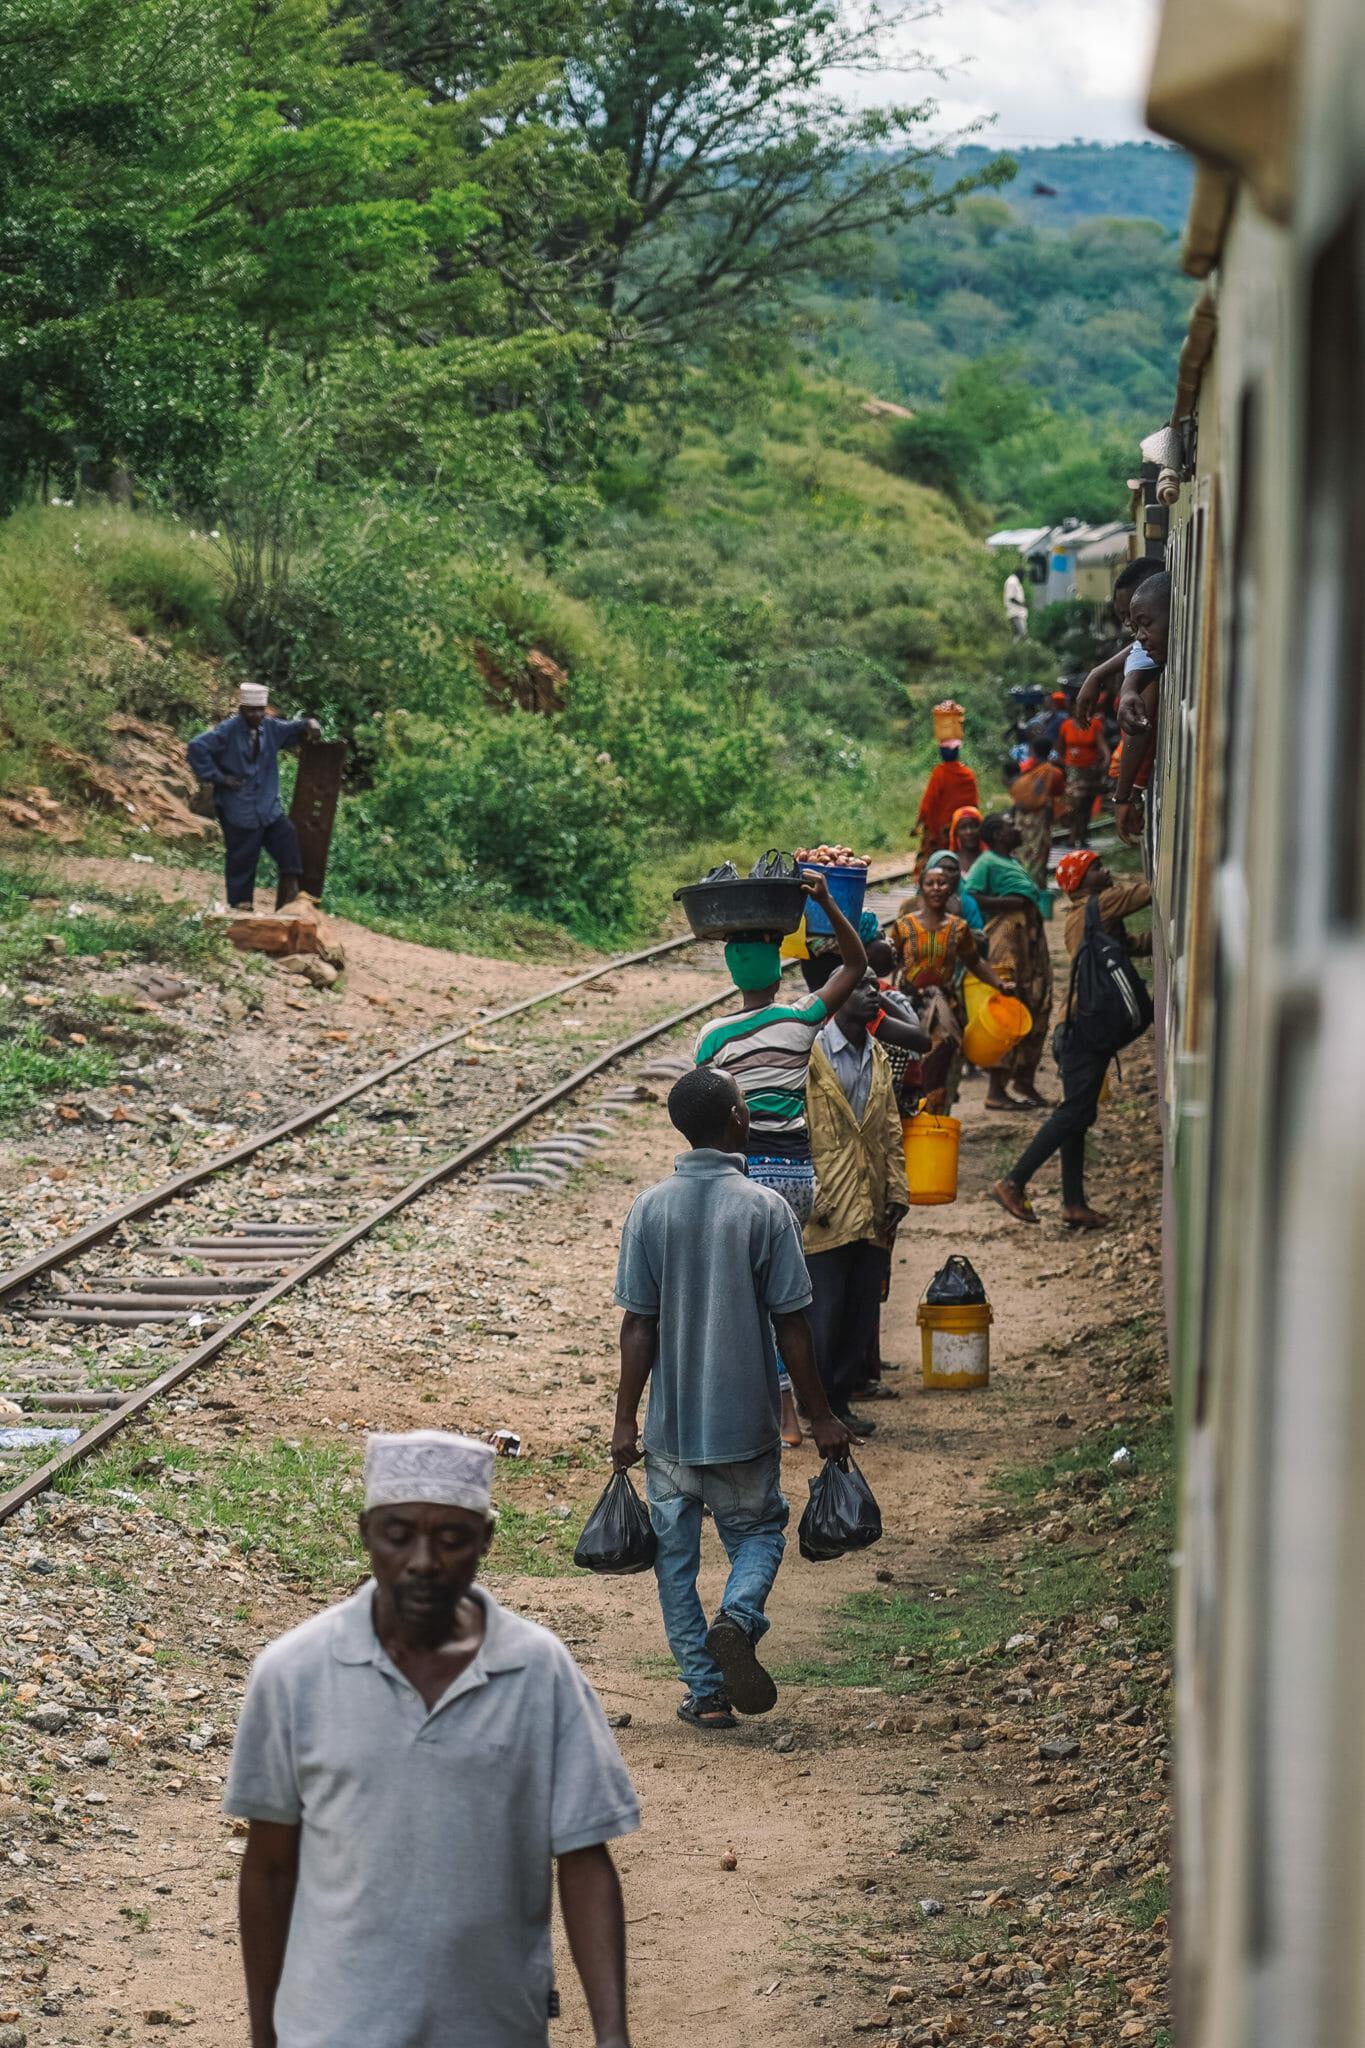 tanzanie-voyage-train-vendeurs